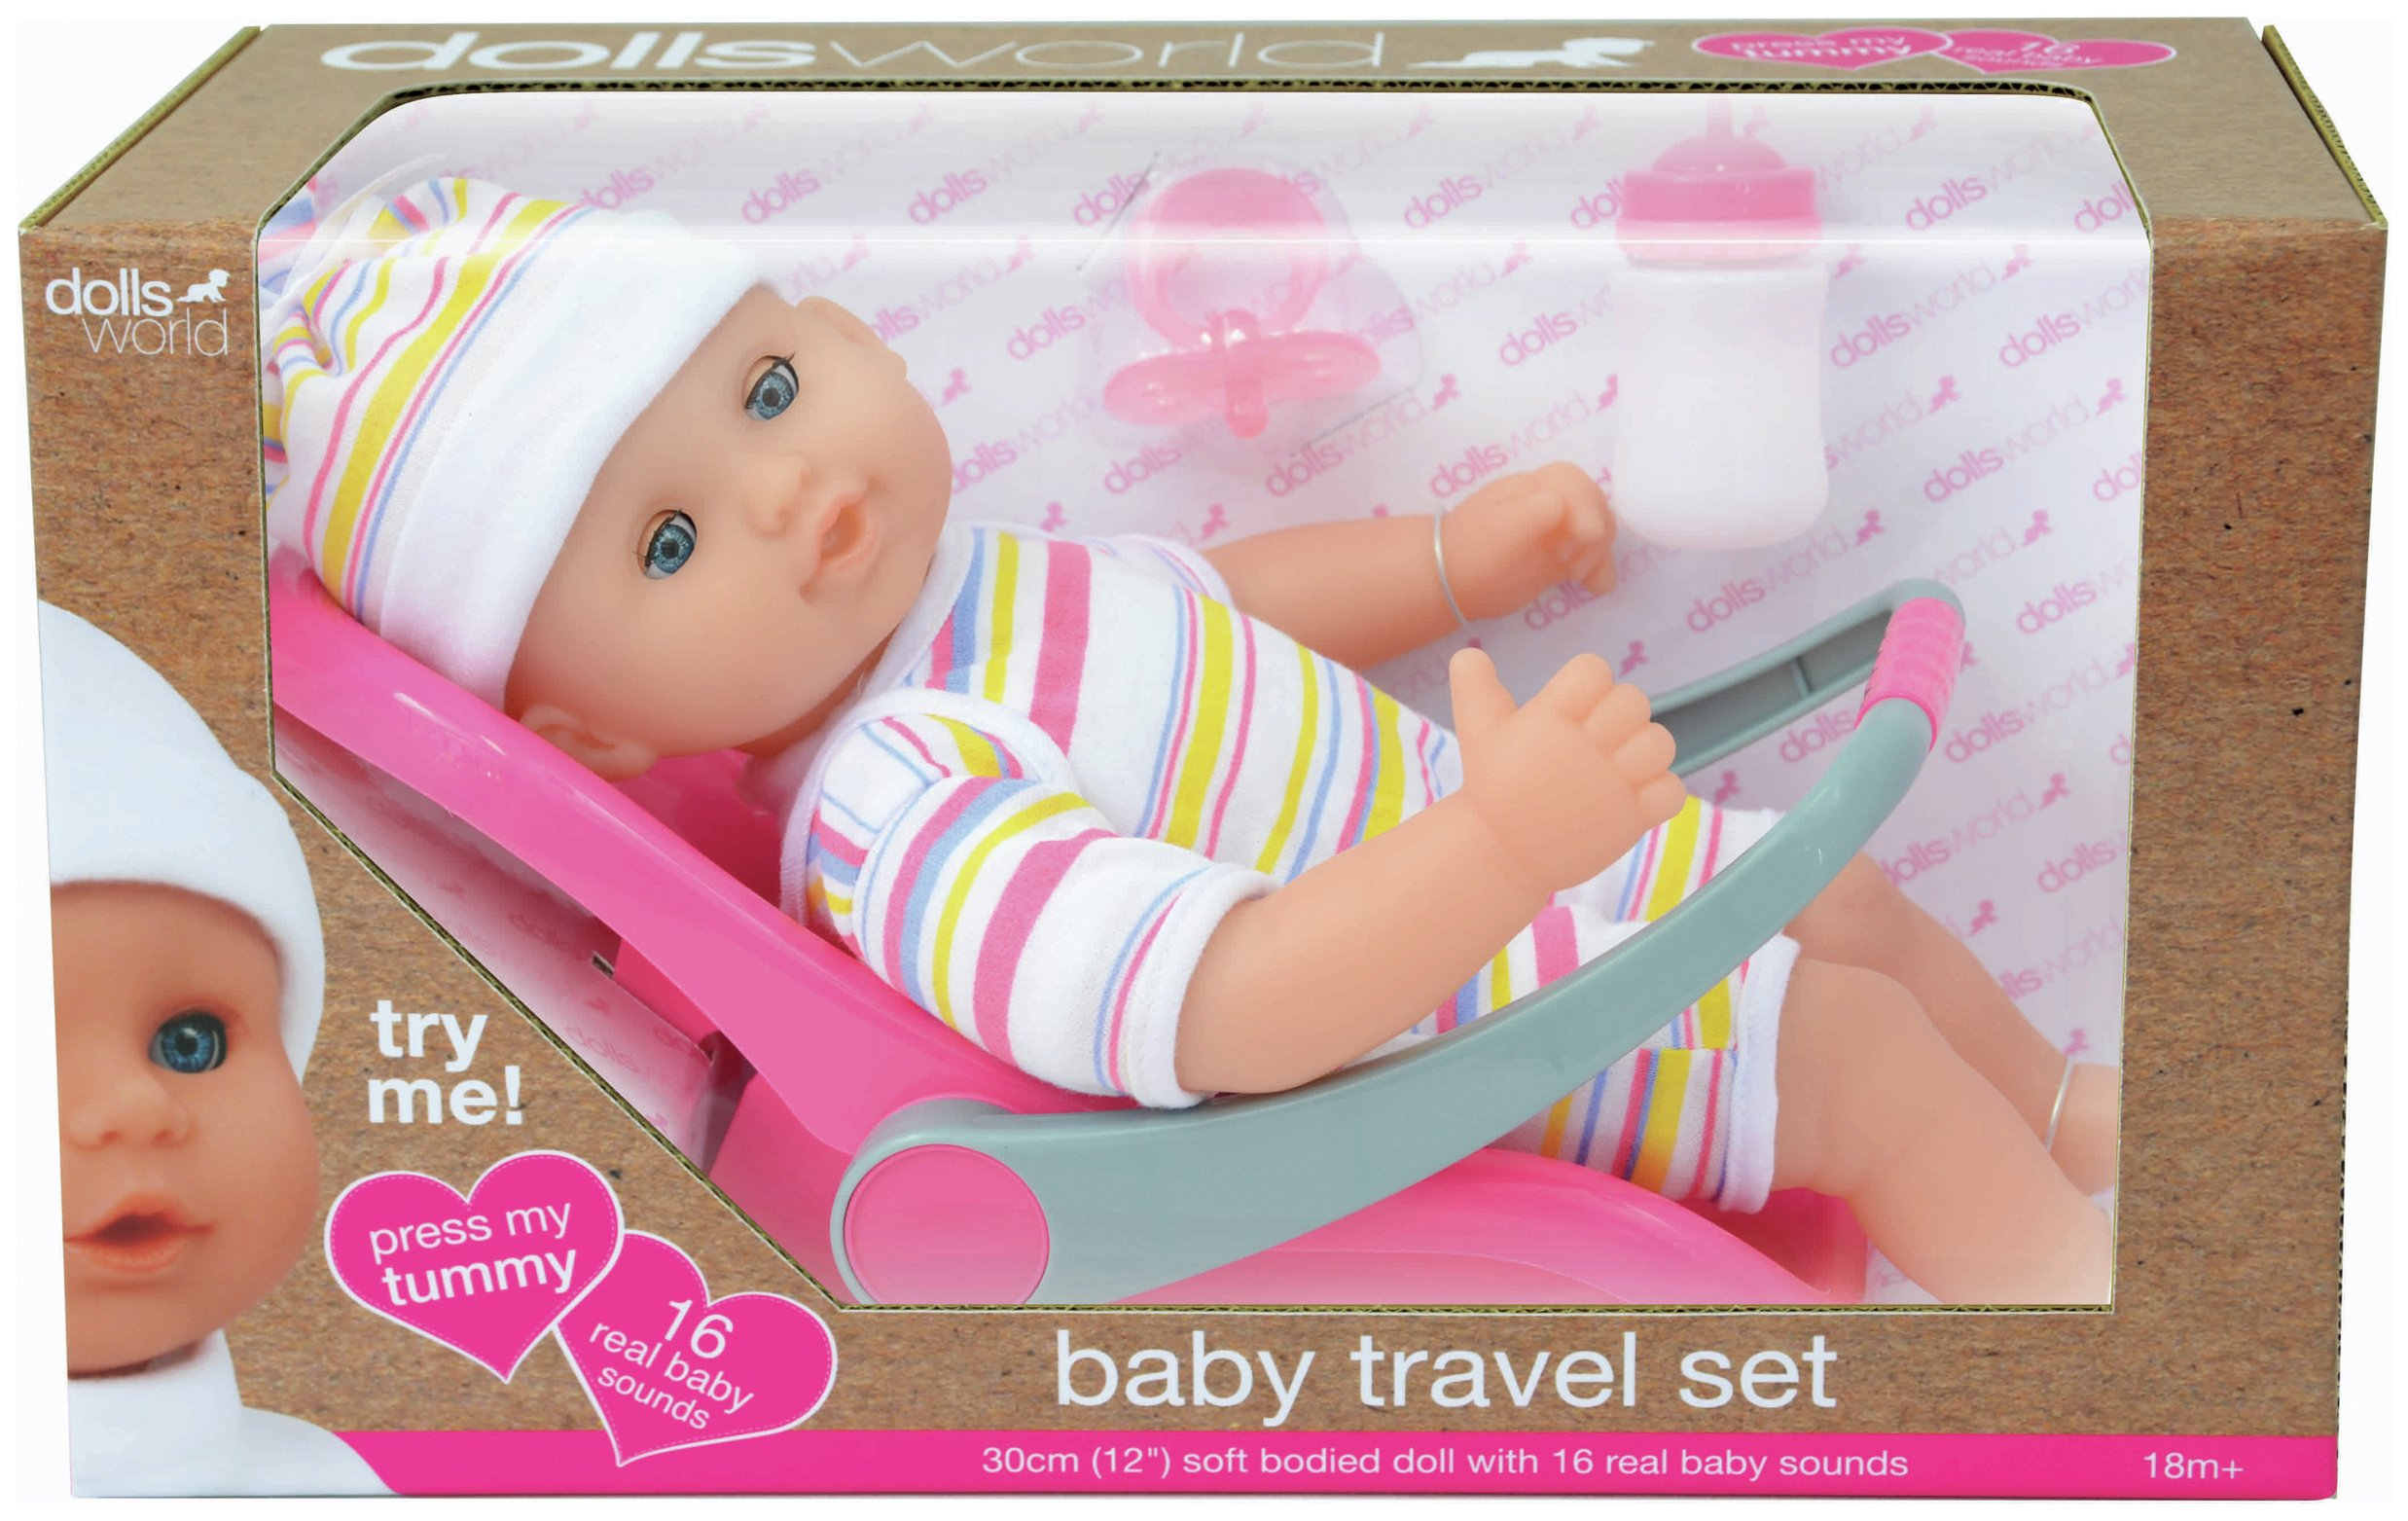 Image of Dollsworld Talking Doll with Travel Set.